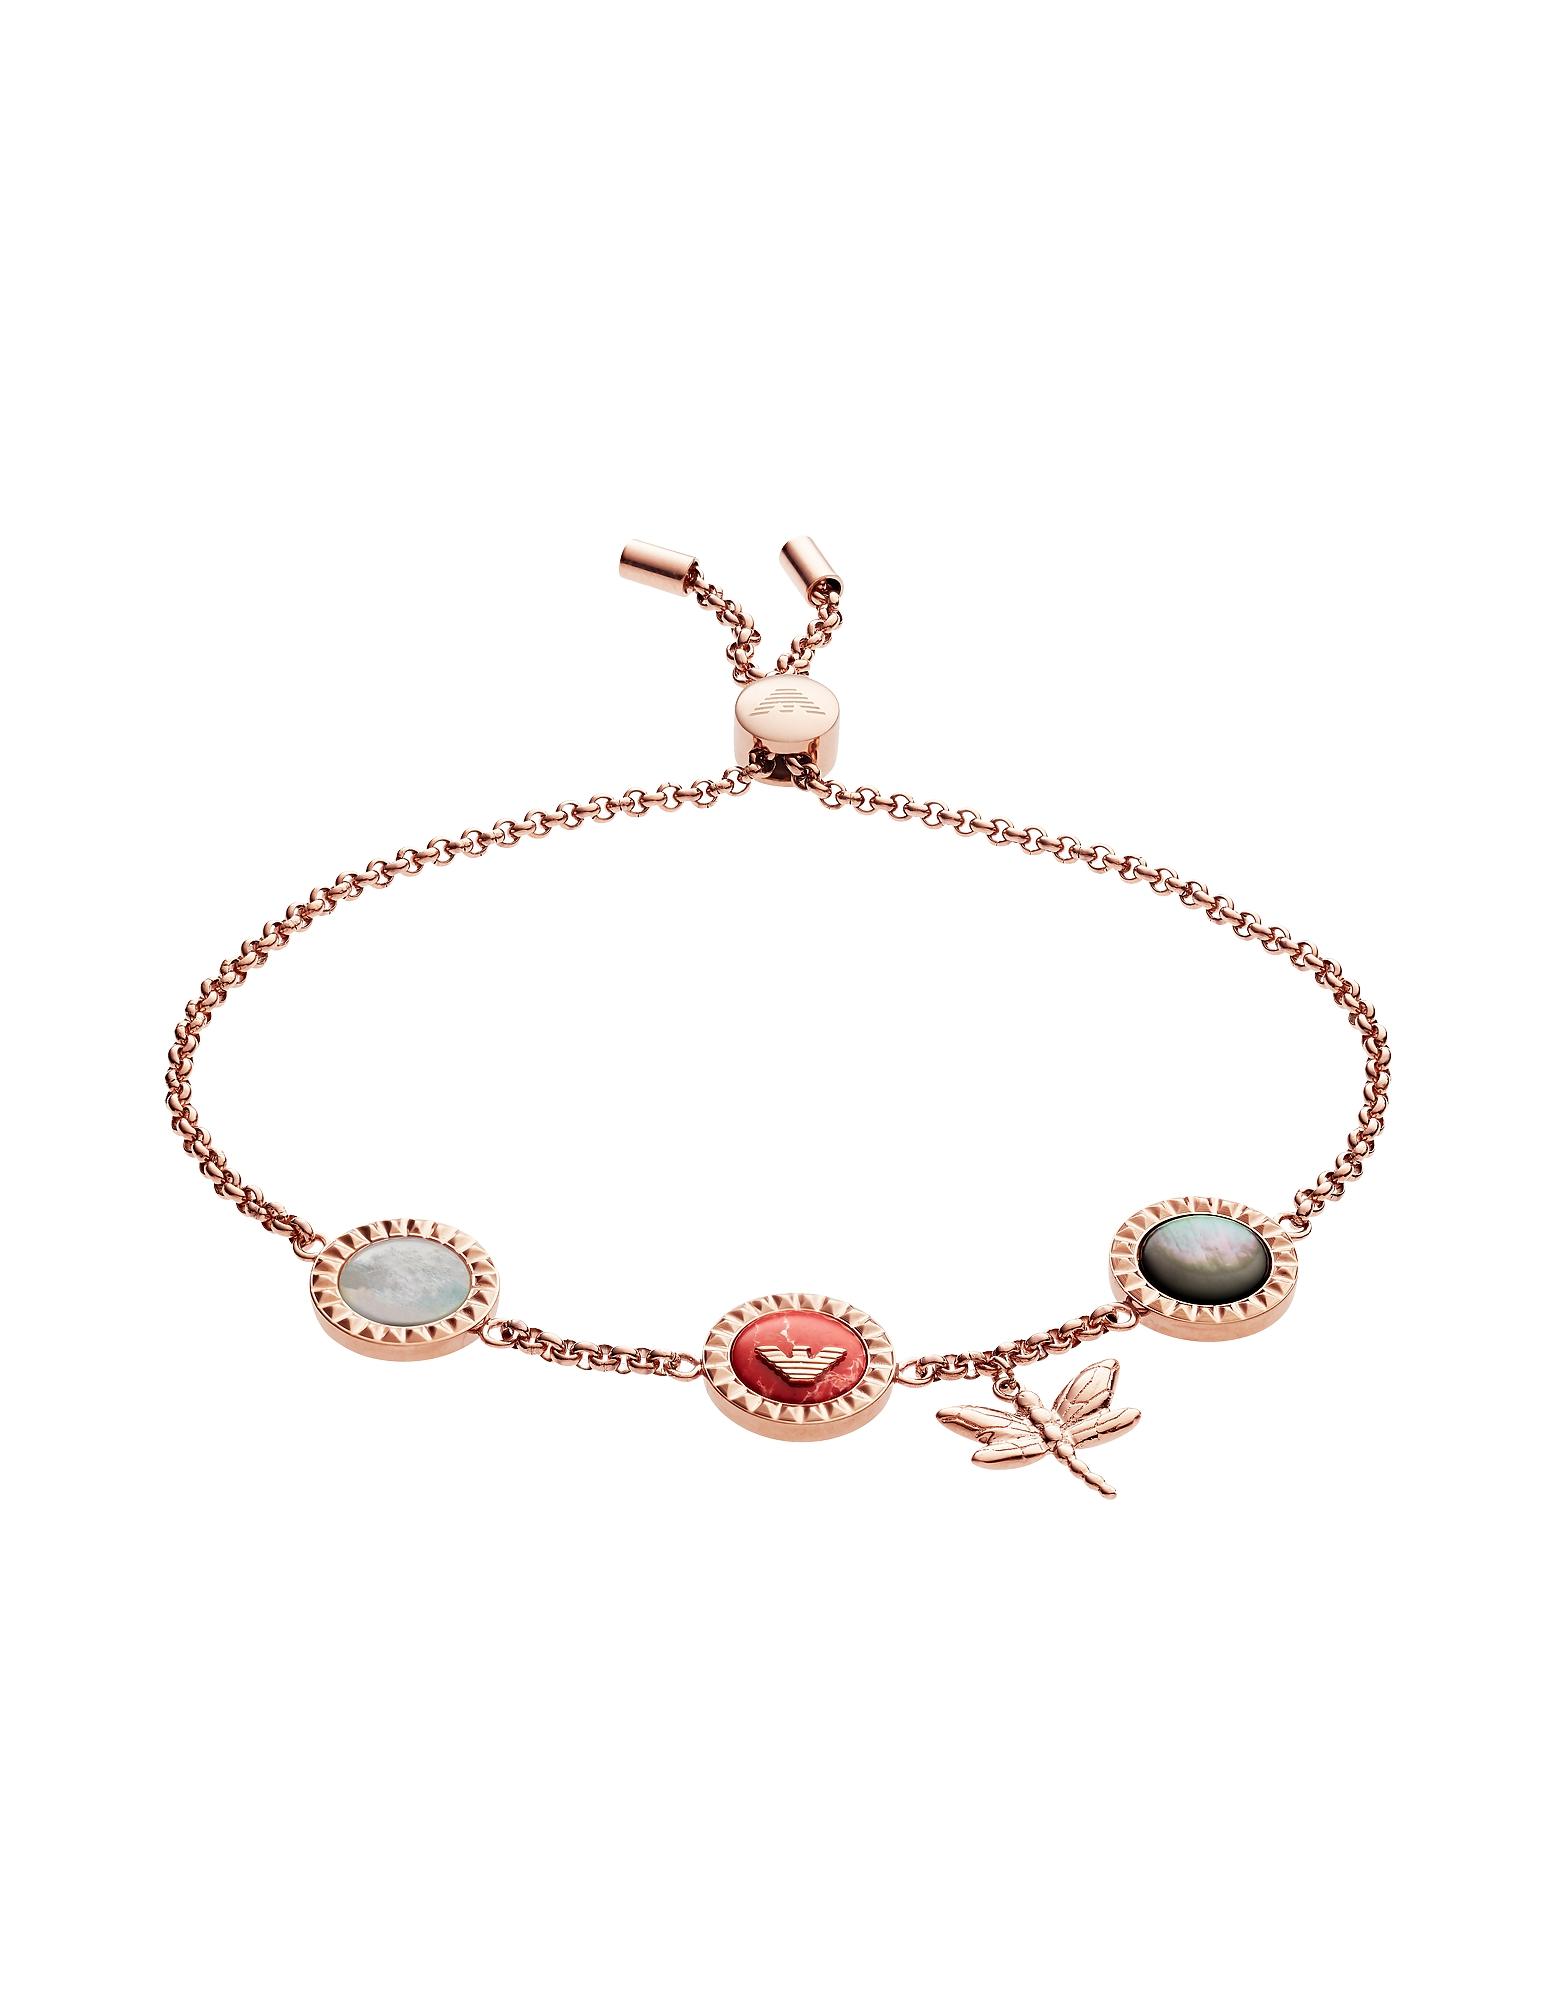 Emporio Armani  Bracelets Dragonfly and Signature Medallion Women's Bracelet